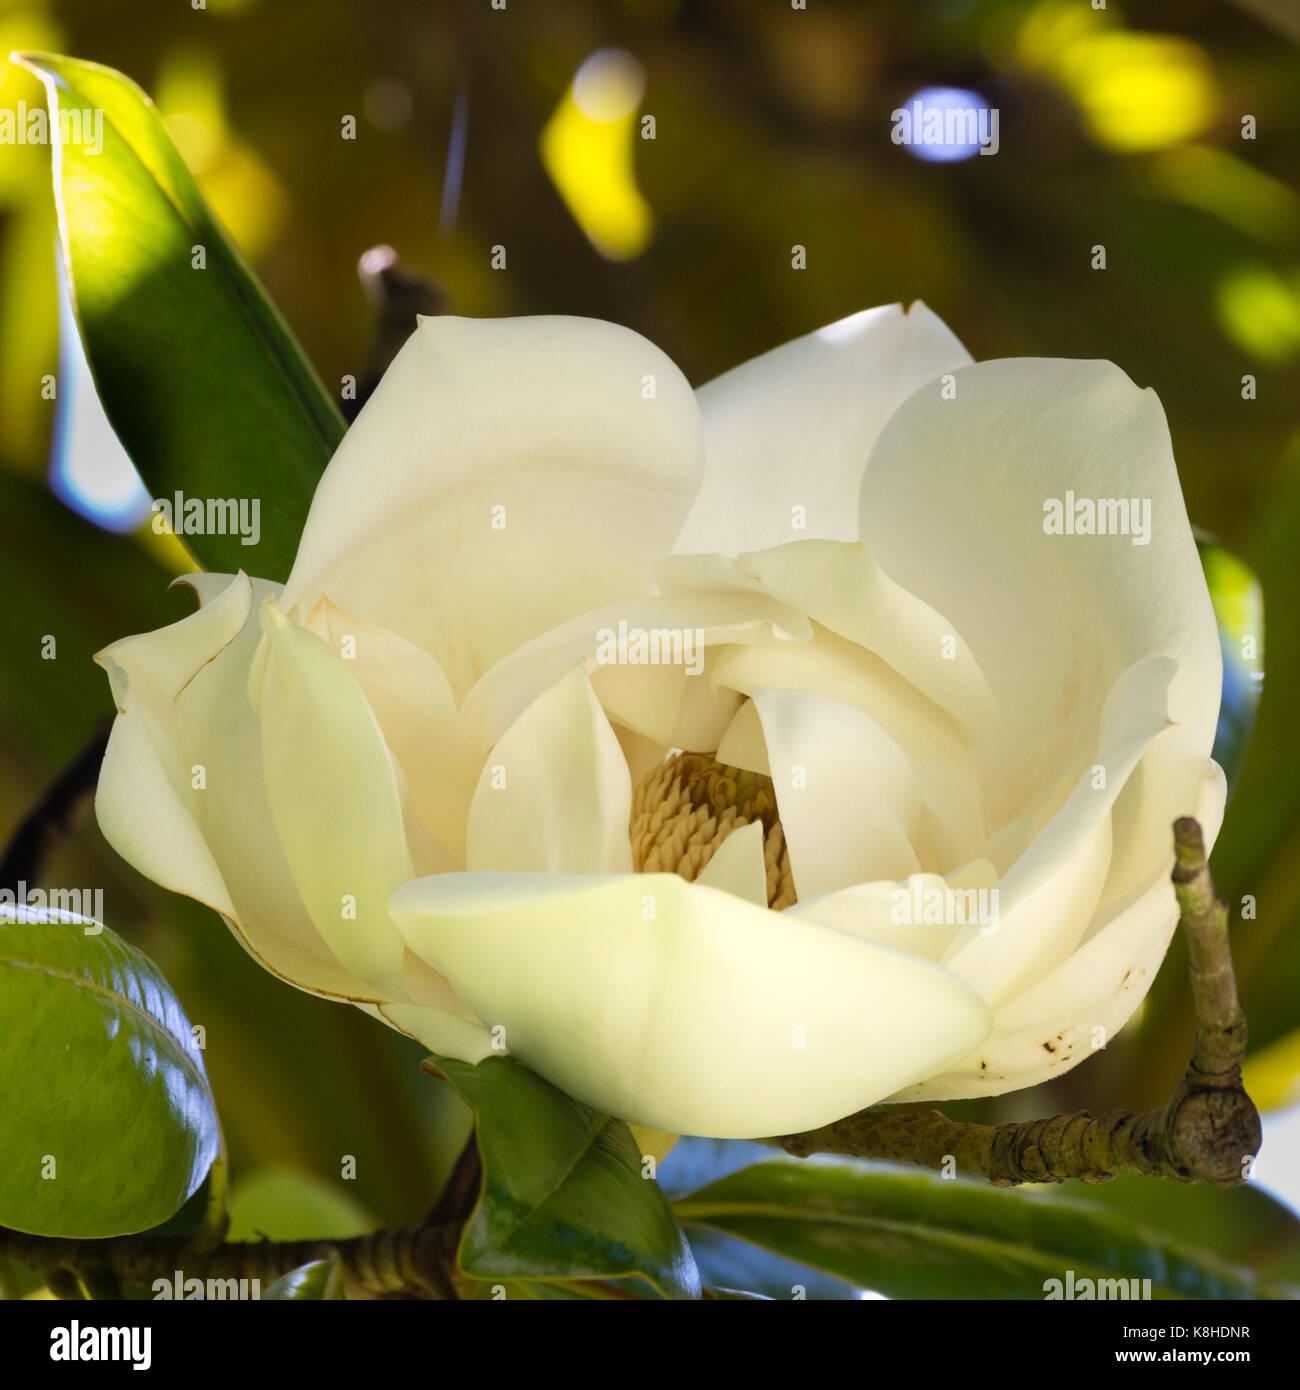 Creamy white fragrant summer flower of the evergreen bull bay tree, Magnolia grandiflora - Stock Image